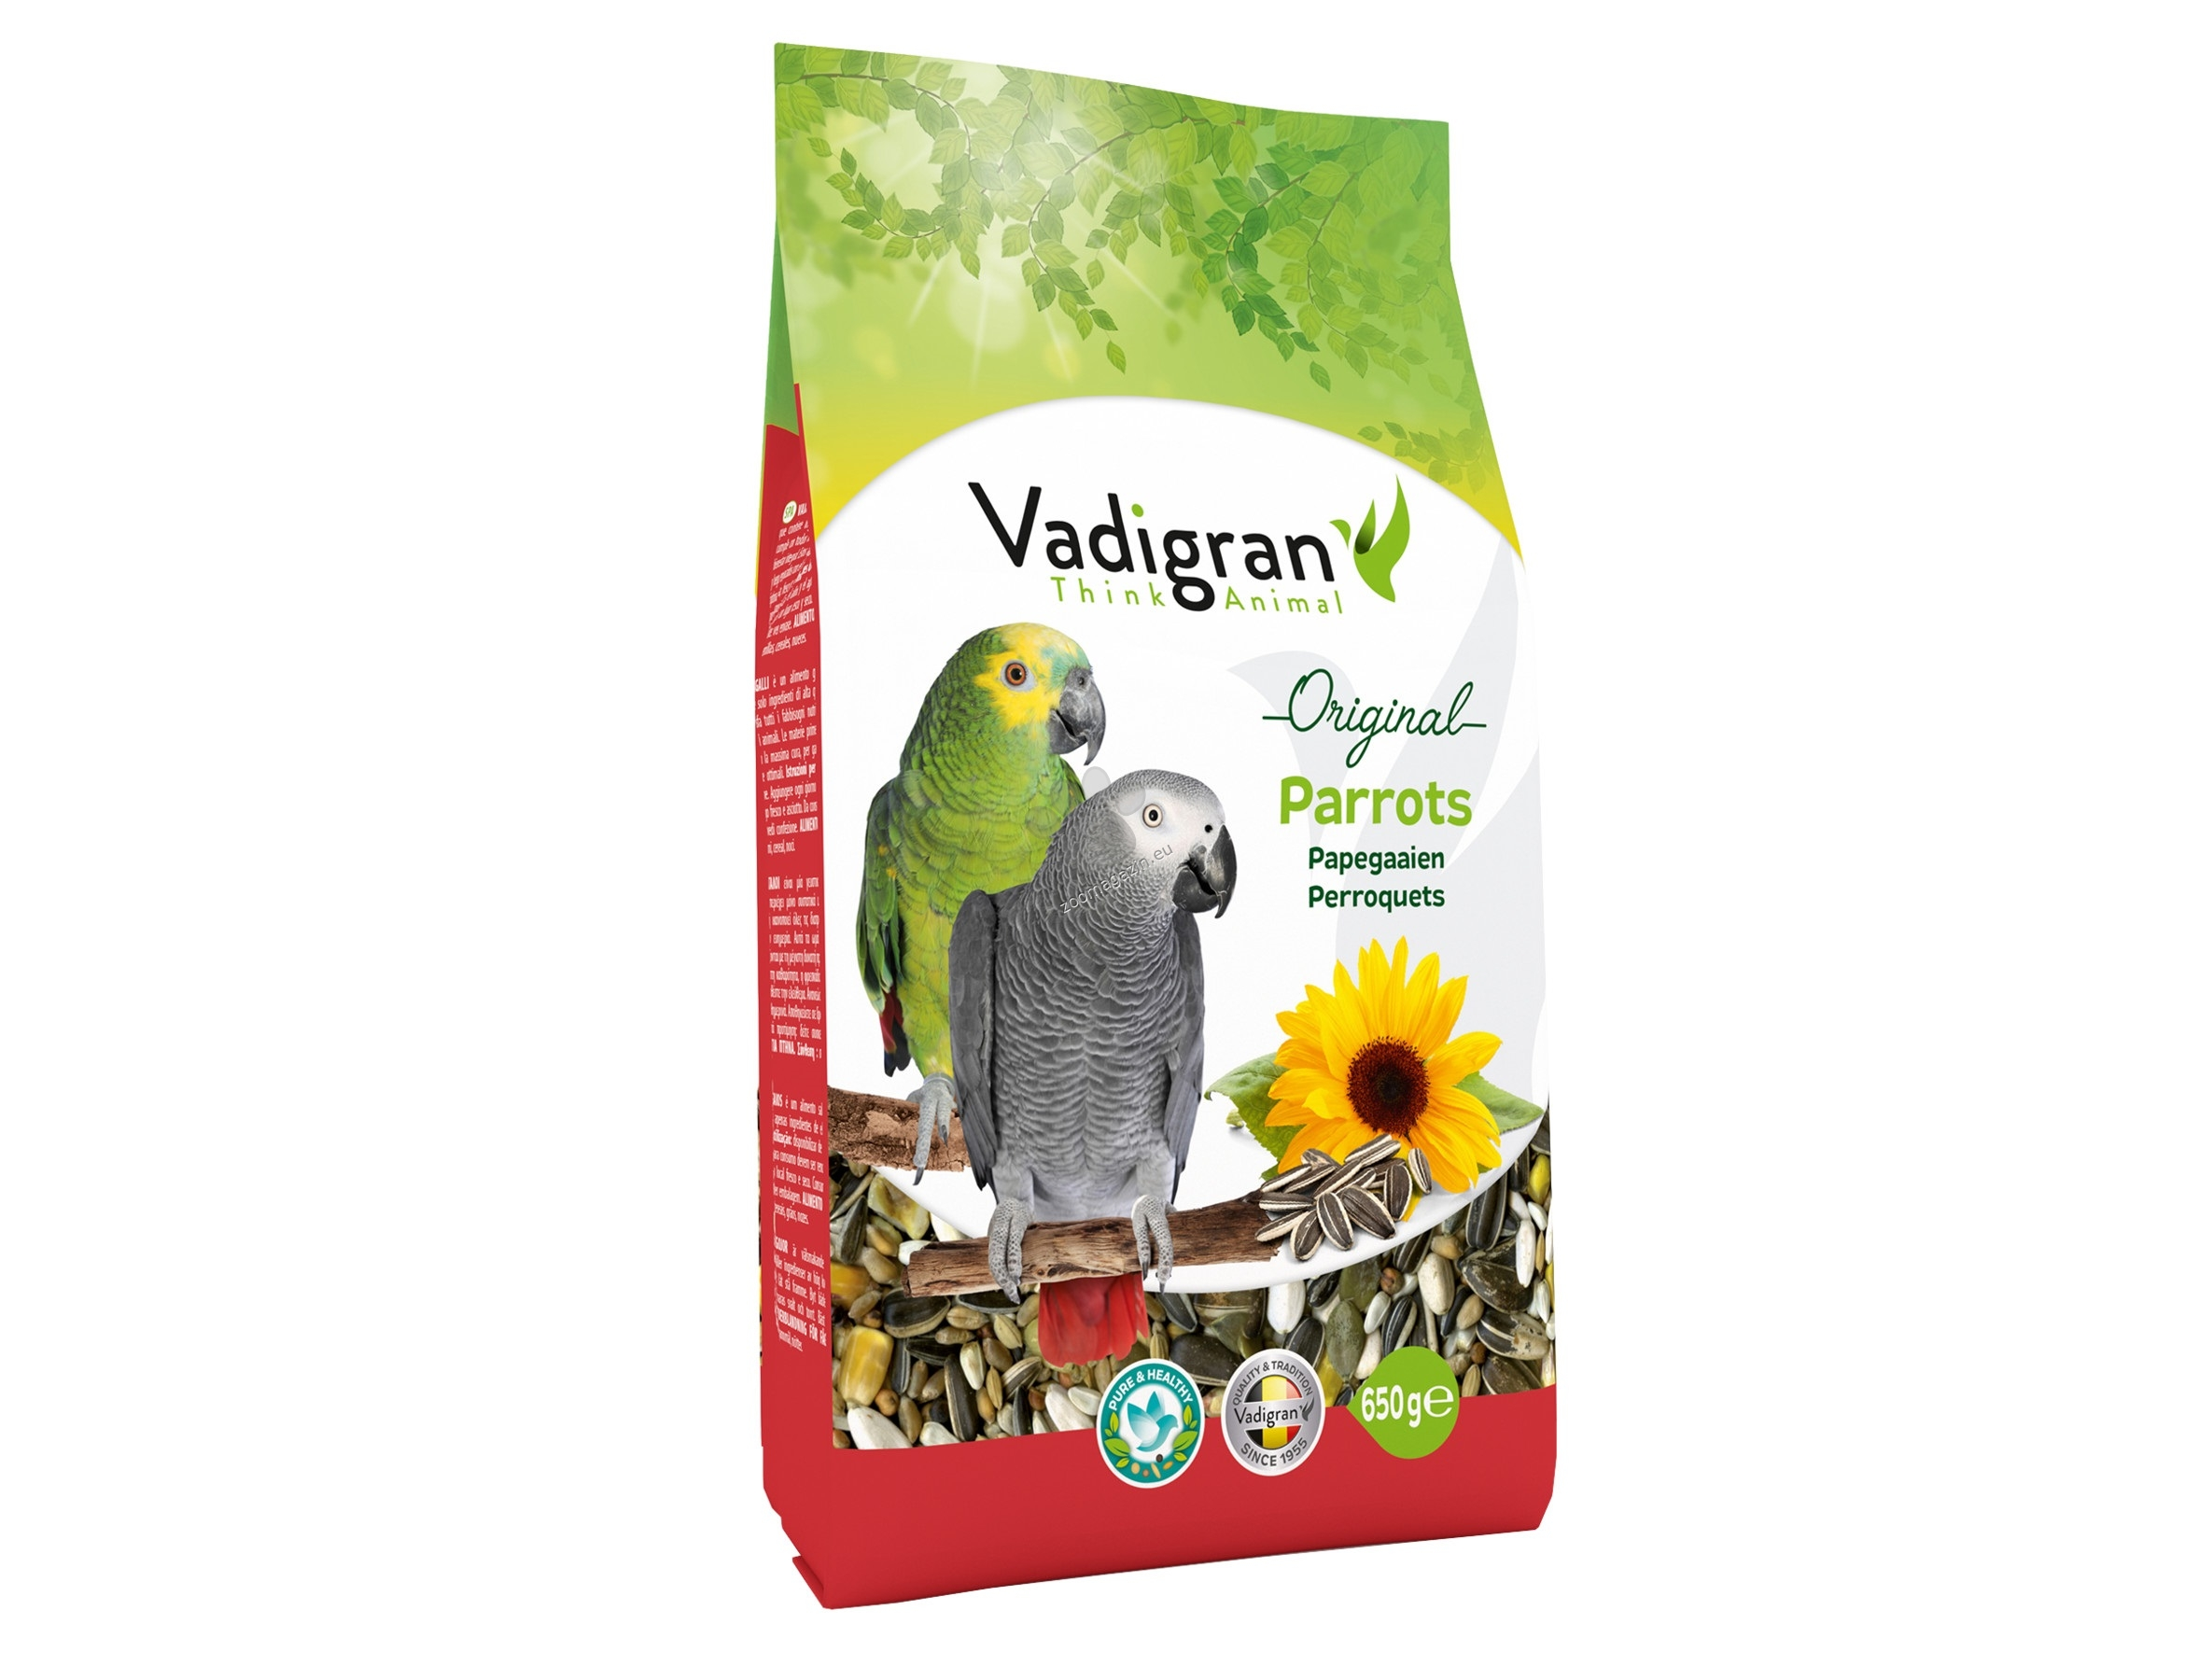 Vadigran - Original Parrot - пълноценна храна за големи папагали 650 гр.